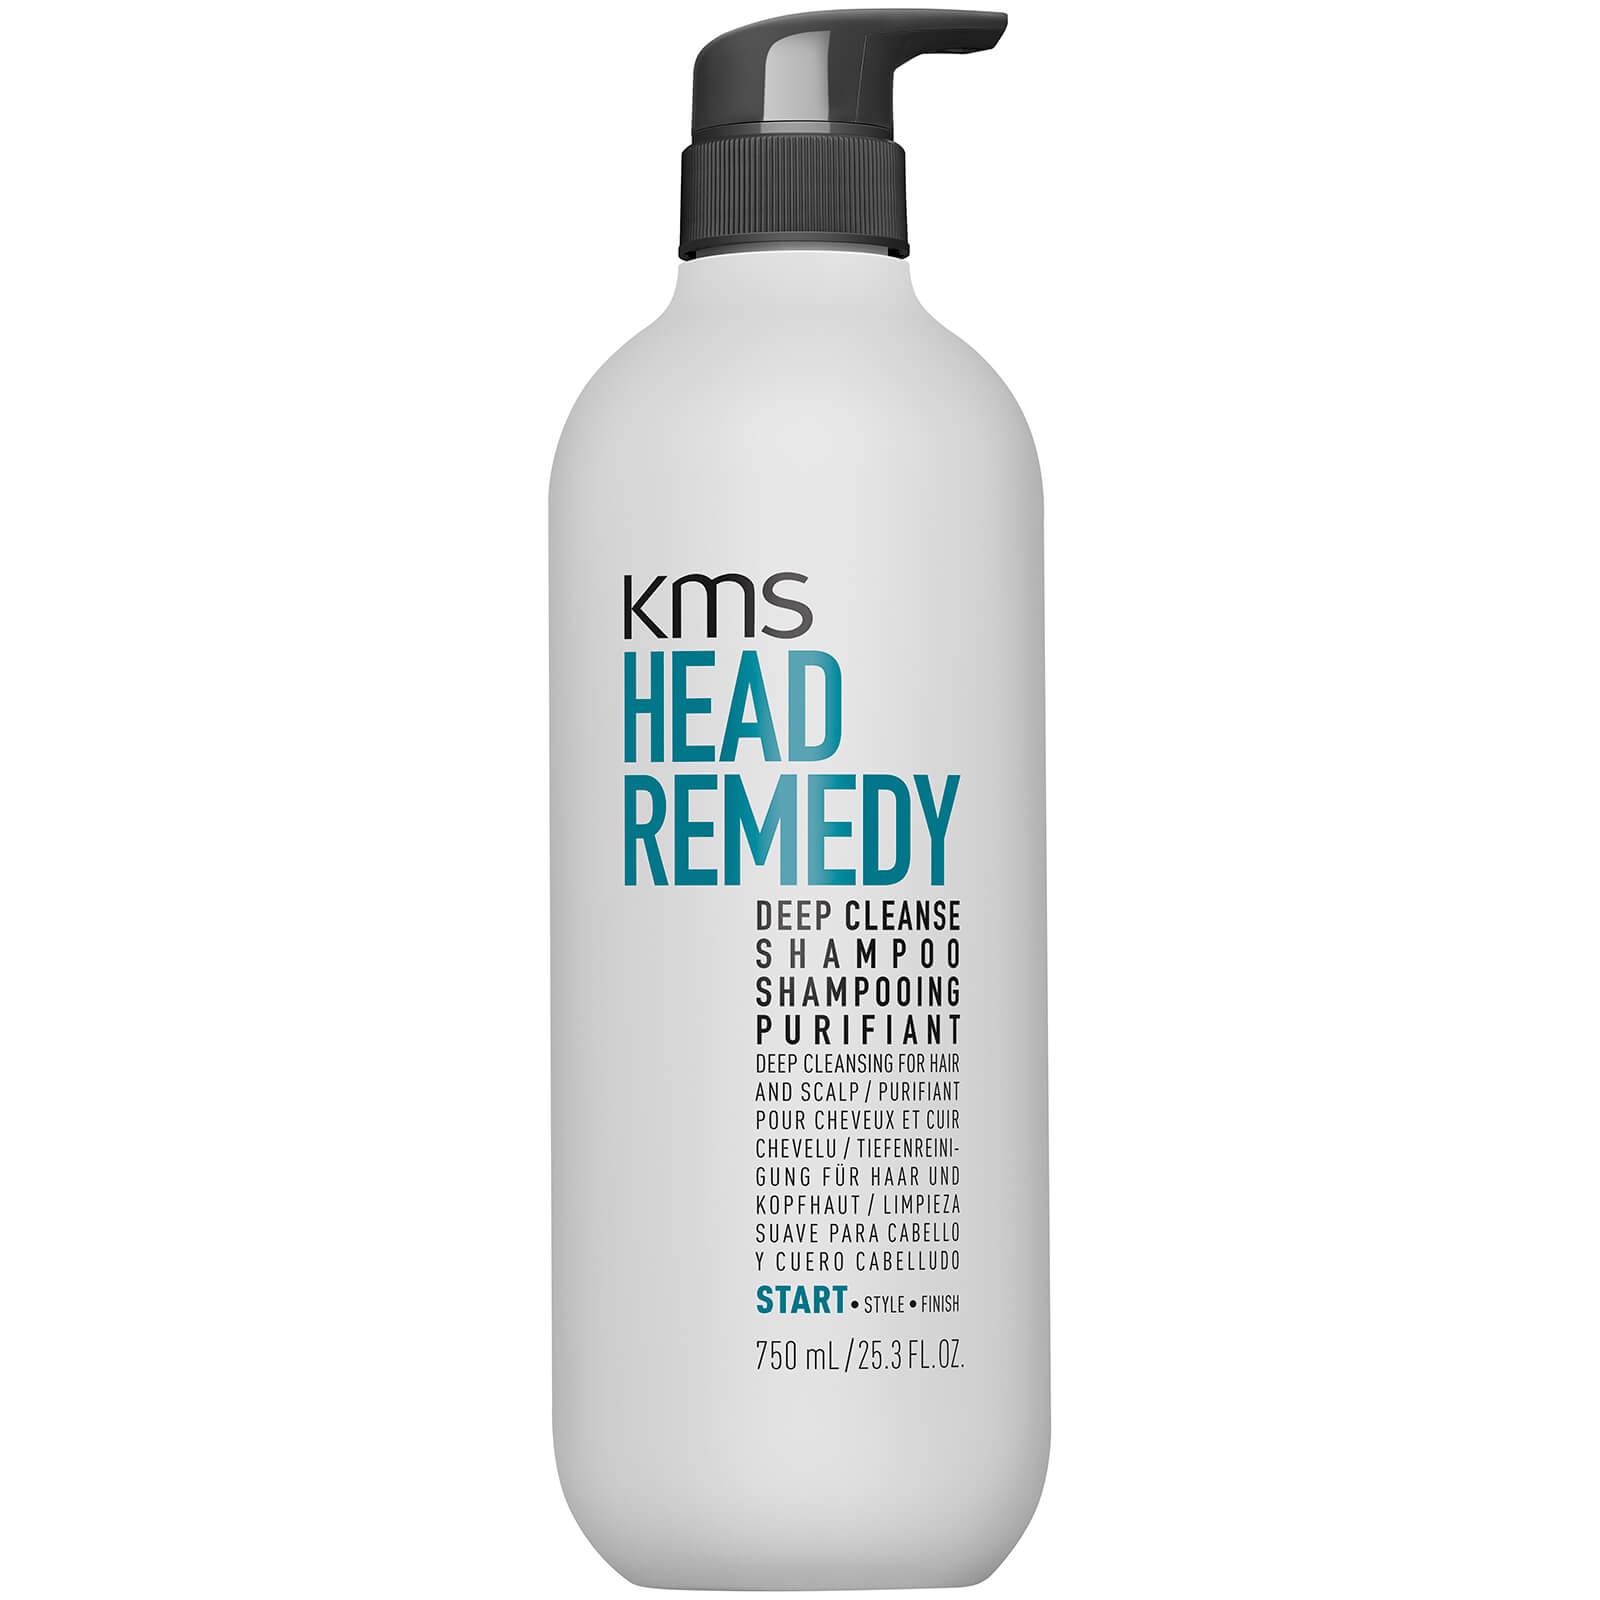 KMS HeadRemedy Deep Cleanse Shampoo 750ml